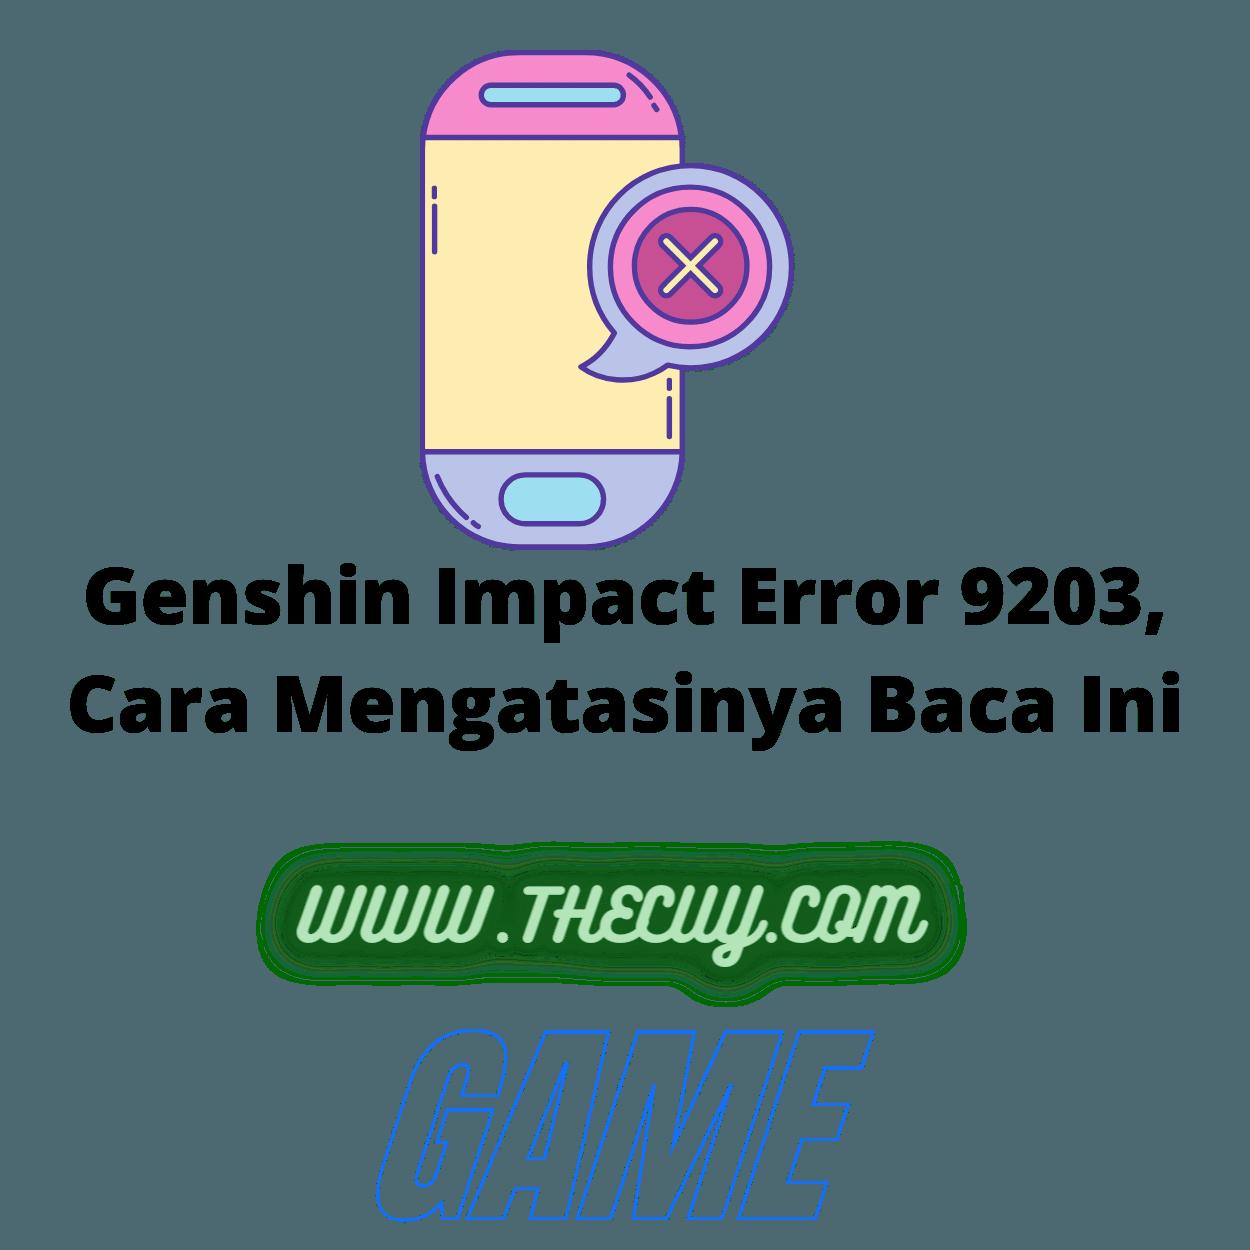 Genshin Impact Error 9203, Cara Mengatasinya Baca Ini